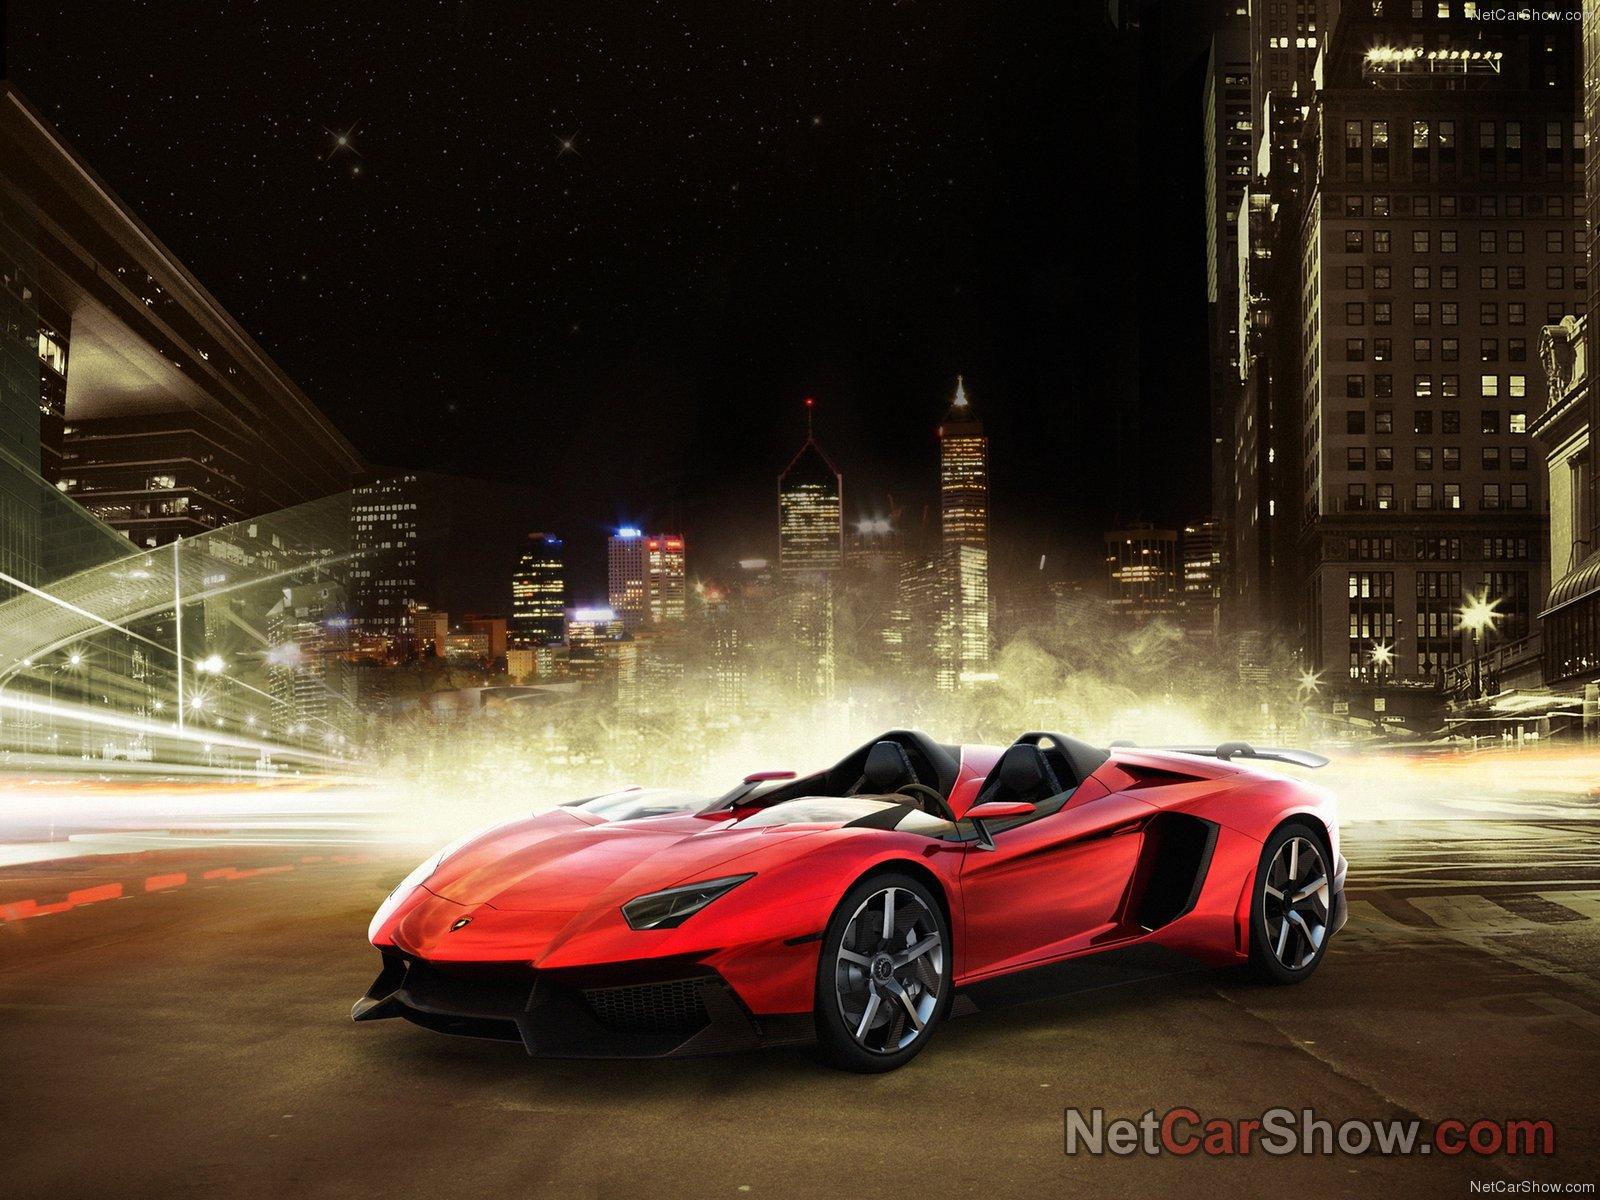 http://4.bp.blogspot.com/-FMeeaTVaaPw/UFgu0bcdBHI/AAAAAAAAA2Q/7AQ9606NP5A/s1600/Lamborghini-Aventador_J_Concept_2012.jpg